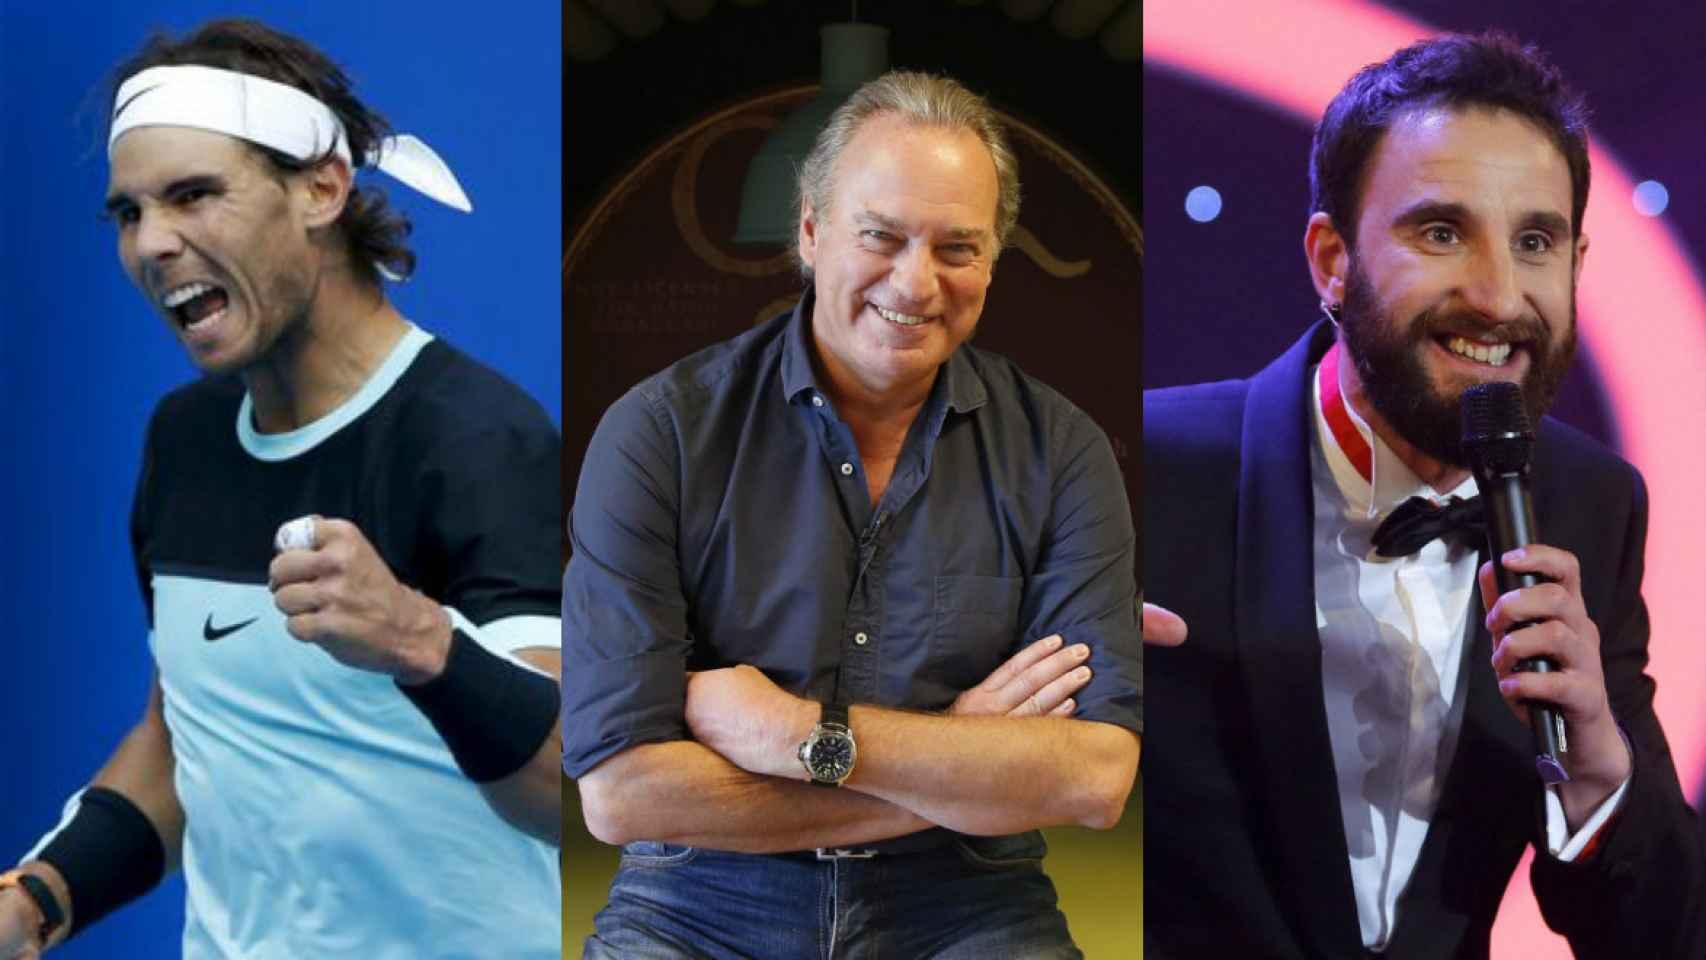 Rafa Nadal, Bertín Osborne y Dani Rovira, tres jefes ideales.